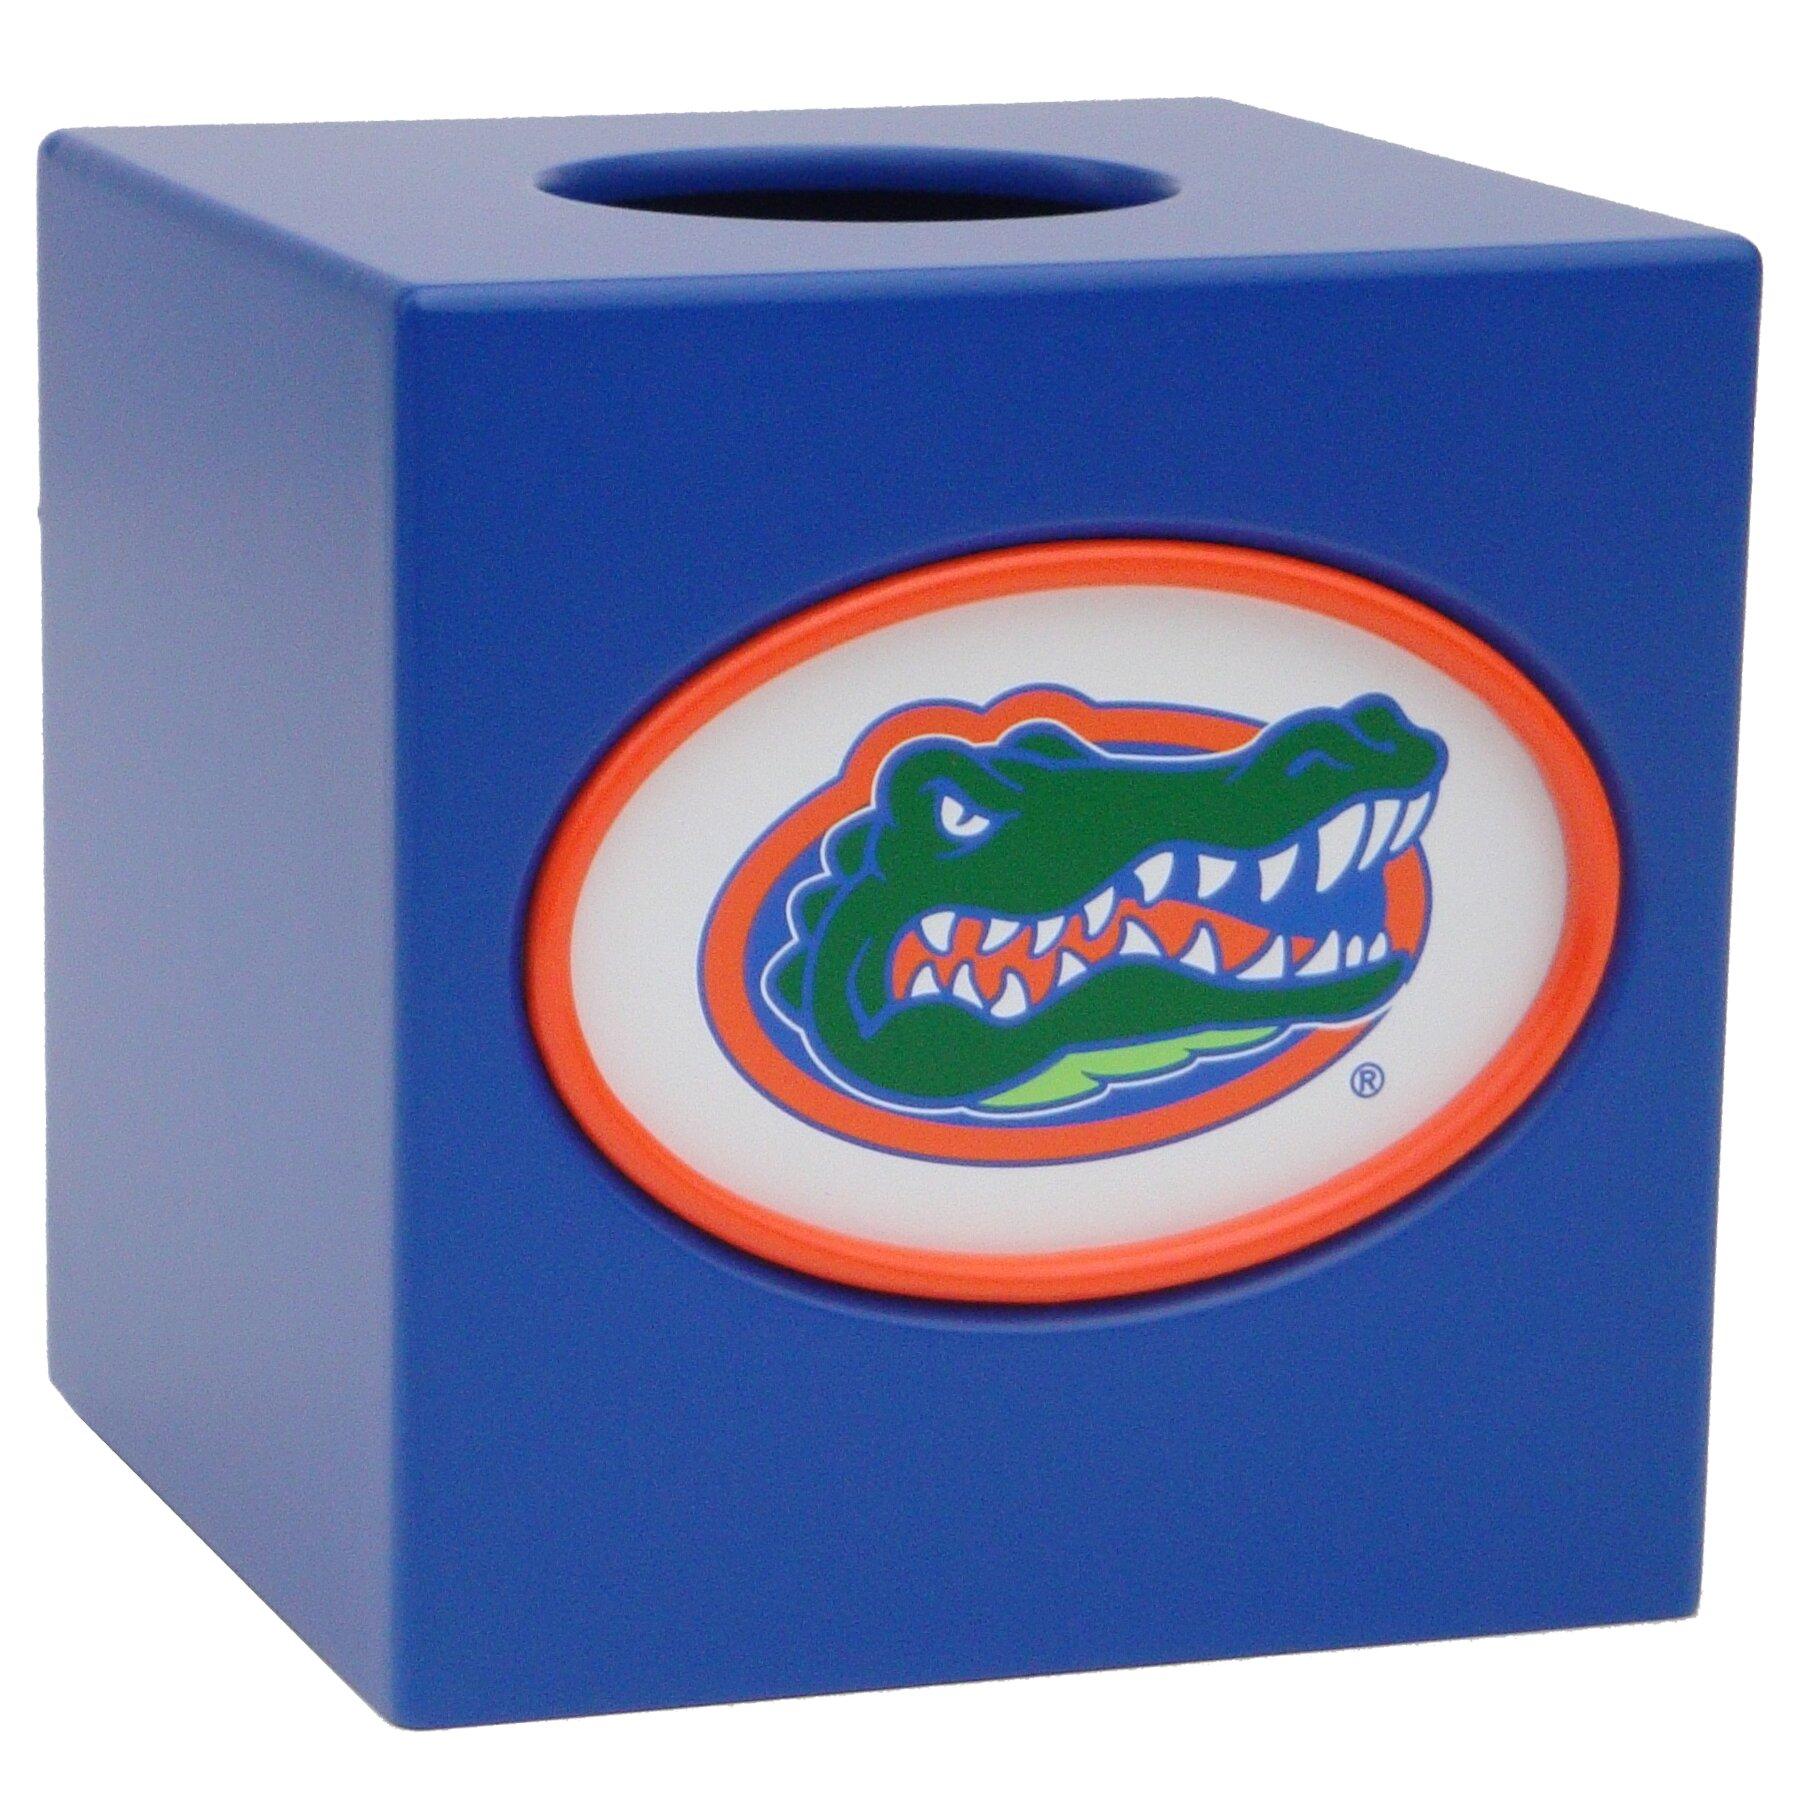 Florida gators bathroom accessories 28 images buy florida gators 15 pc bathroom combo set - Florida gators bathroom decor ...